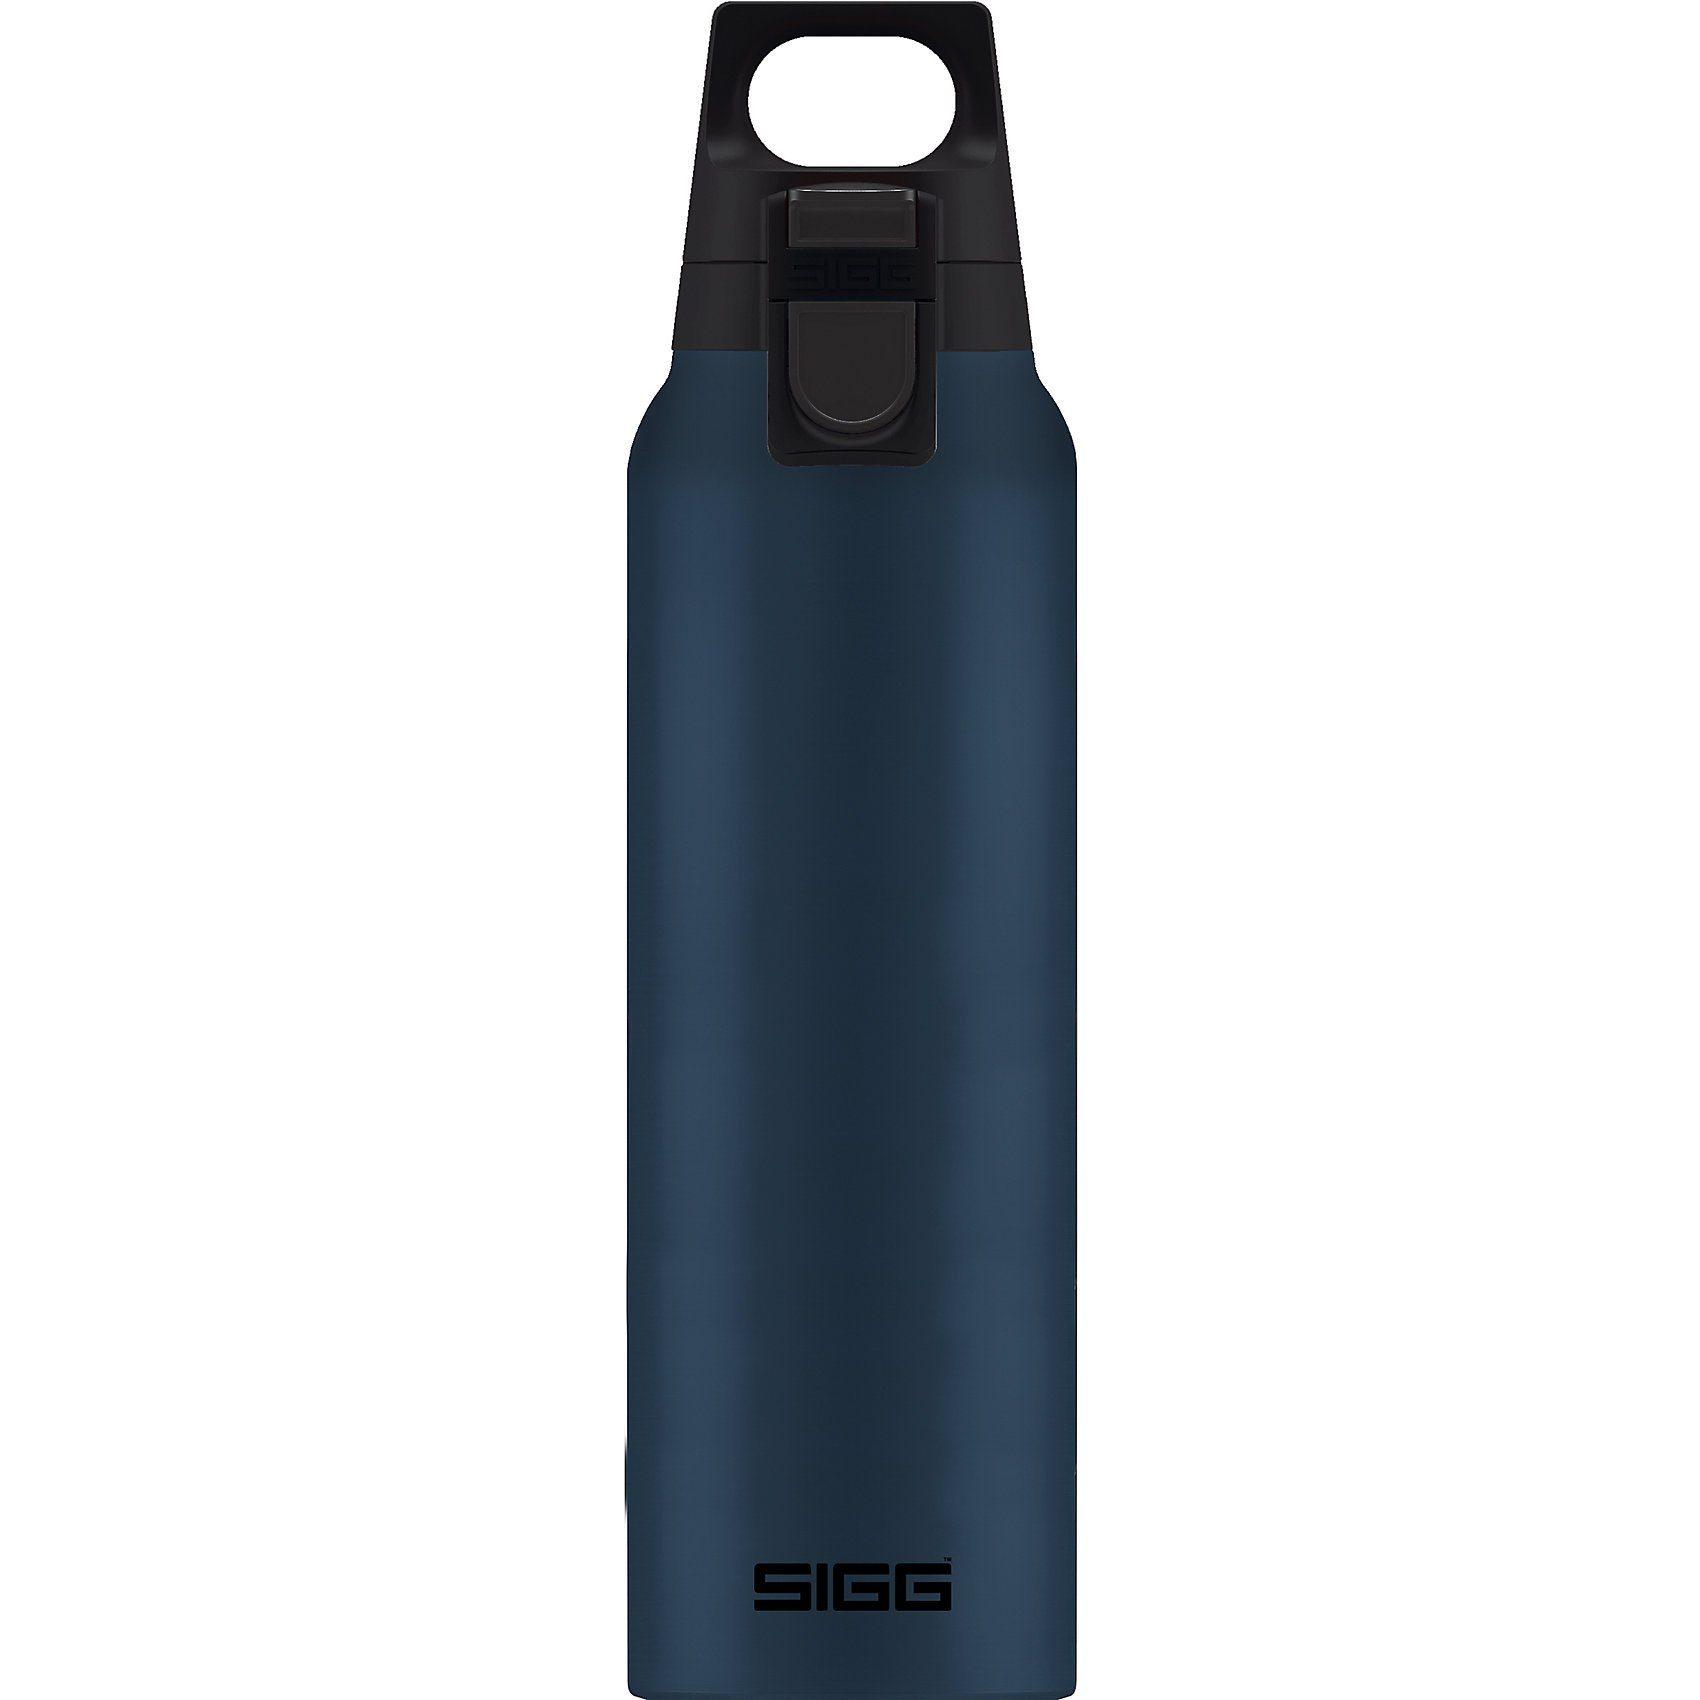 Sigg Thermoflasche Hot & Cold ONE Dark, 500ml